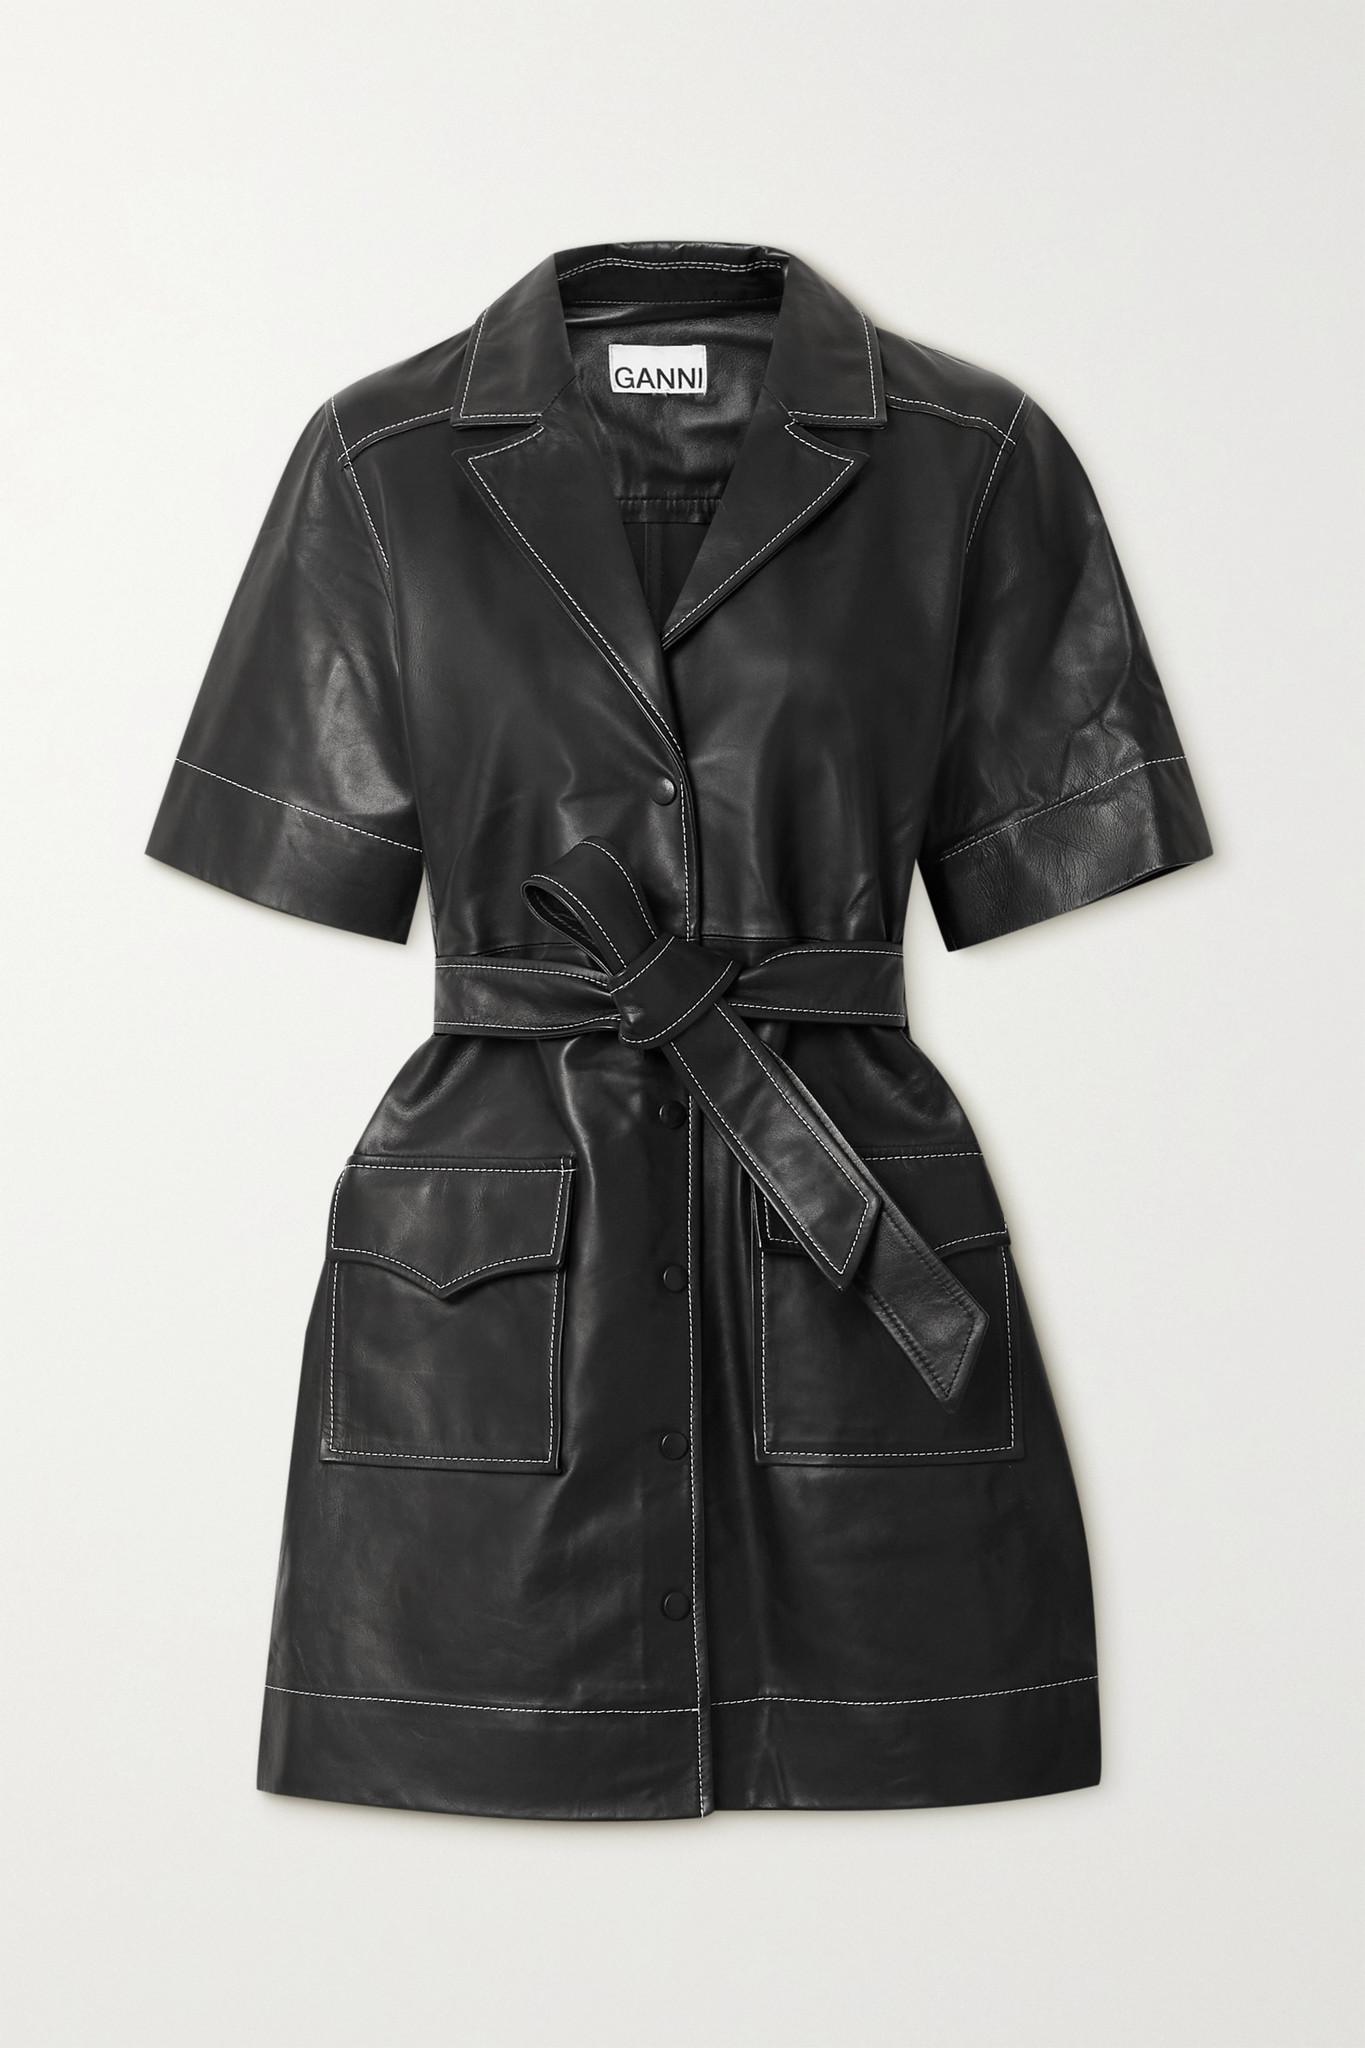 GANNI - Belted Leather Mini Dress - Black - DK38